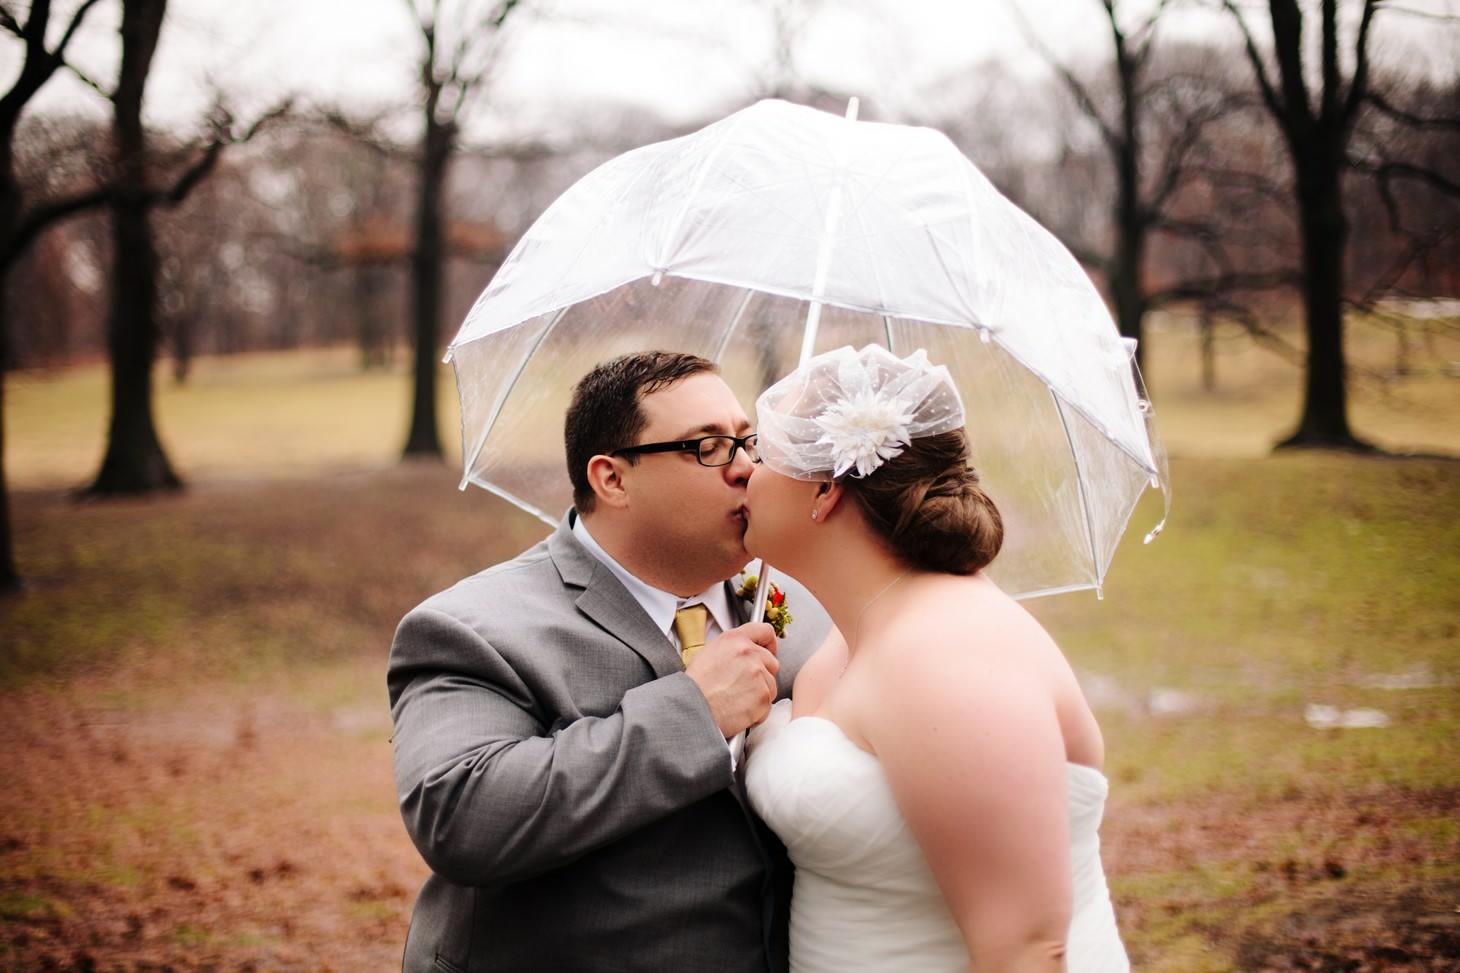 nyc-brooklyn-prospect-park-picnic-house-wedding-smitten-chickens-nerdy-73.jpg